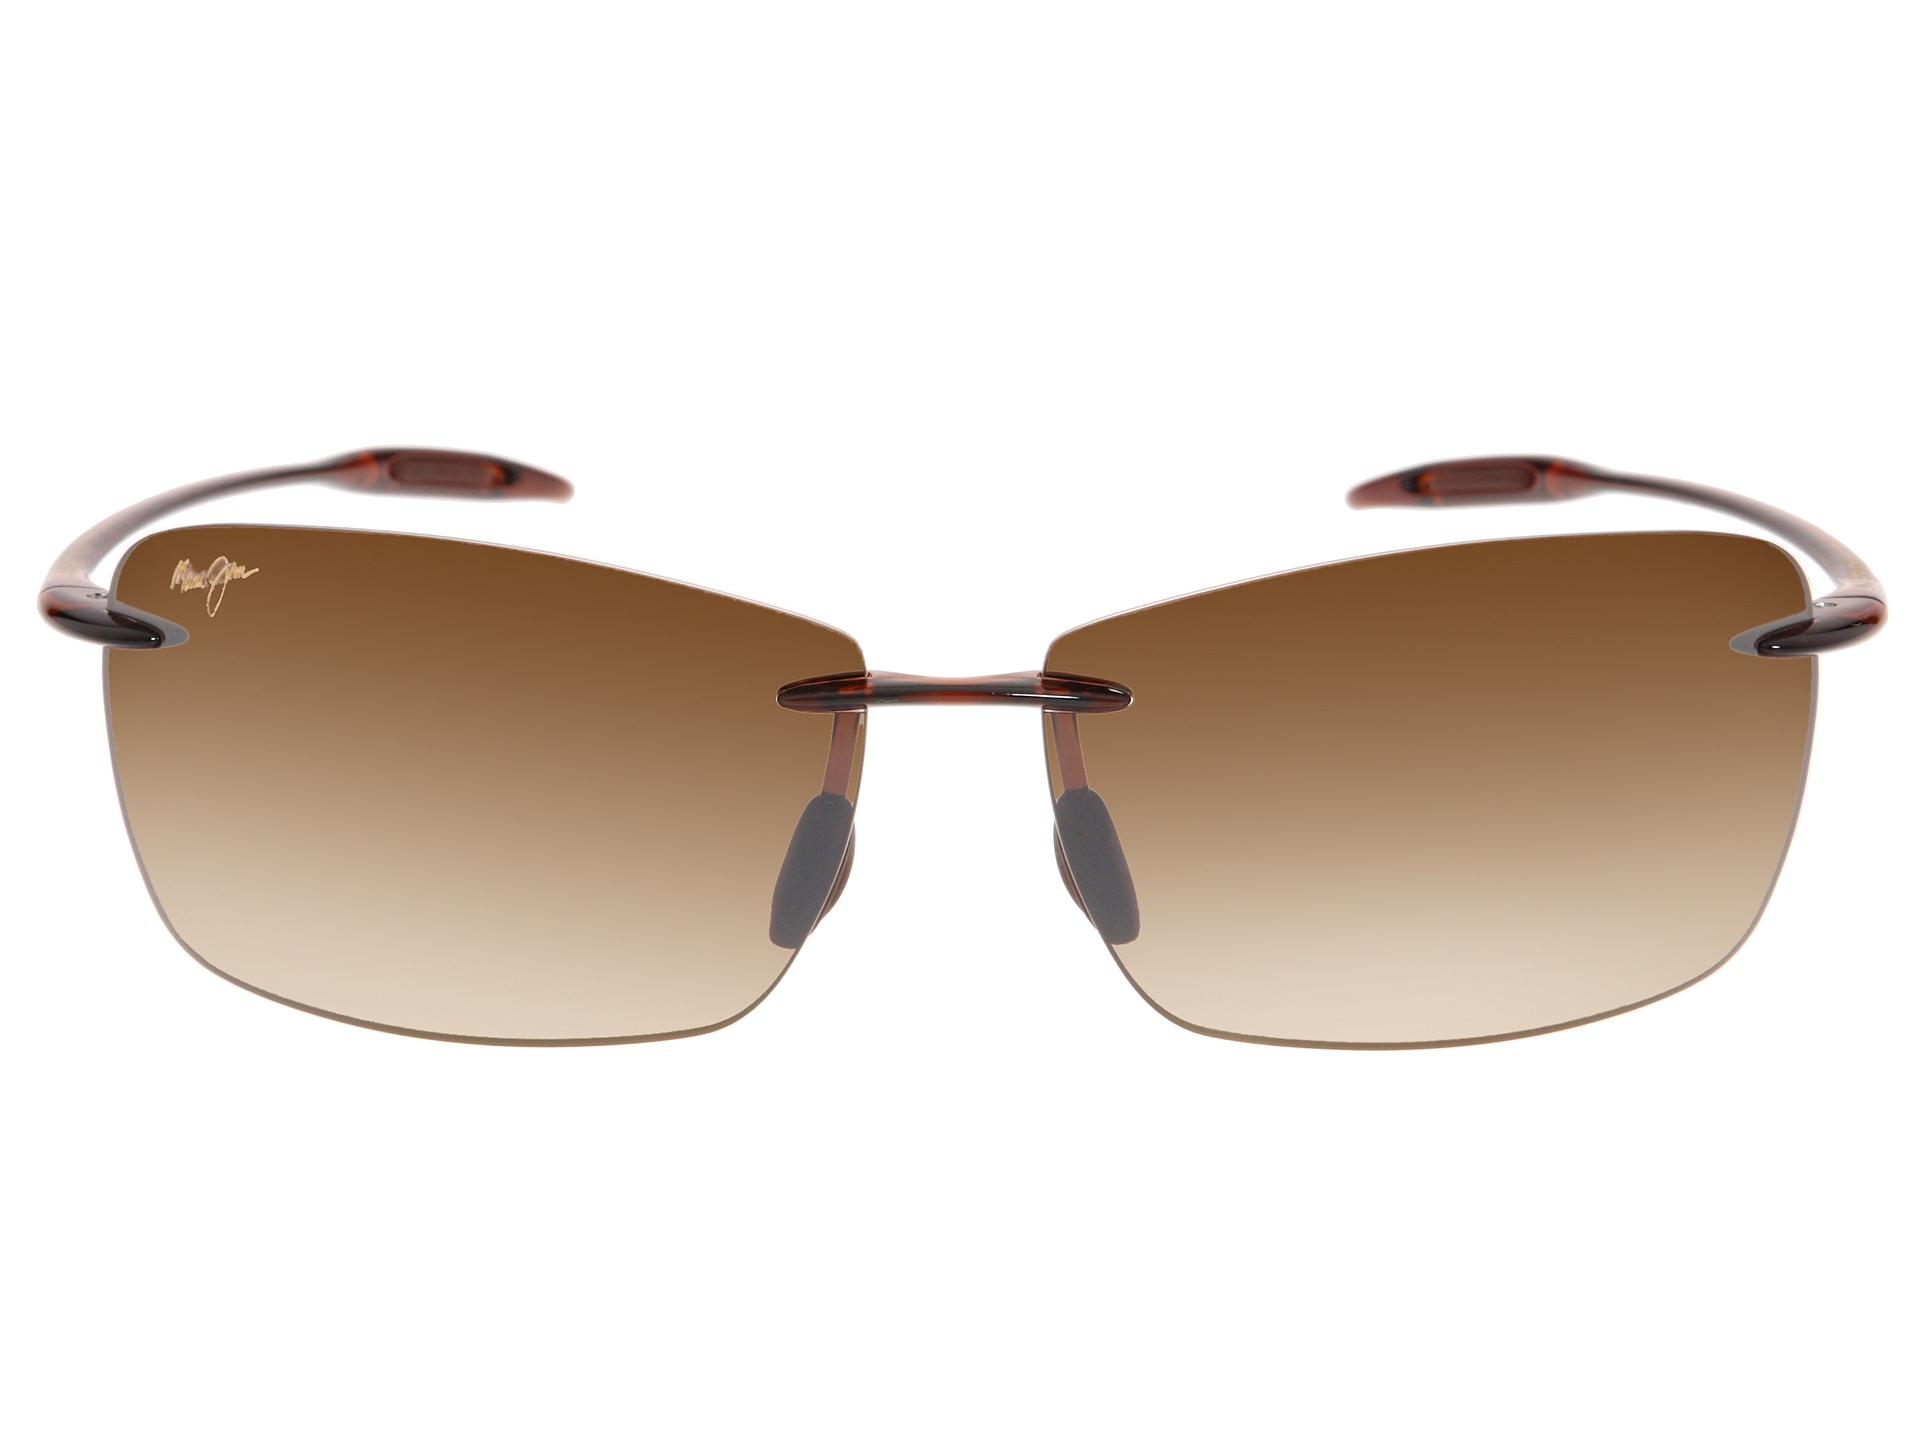 abb2bbb76b Maui Jim Lighthouse Sunglasses For Sale